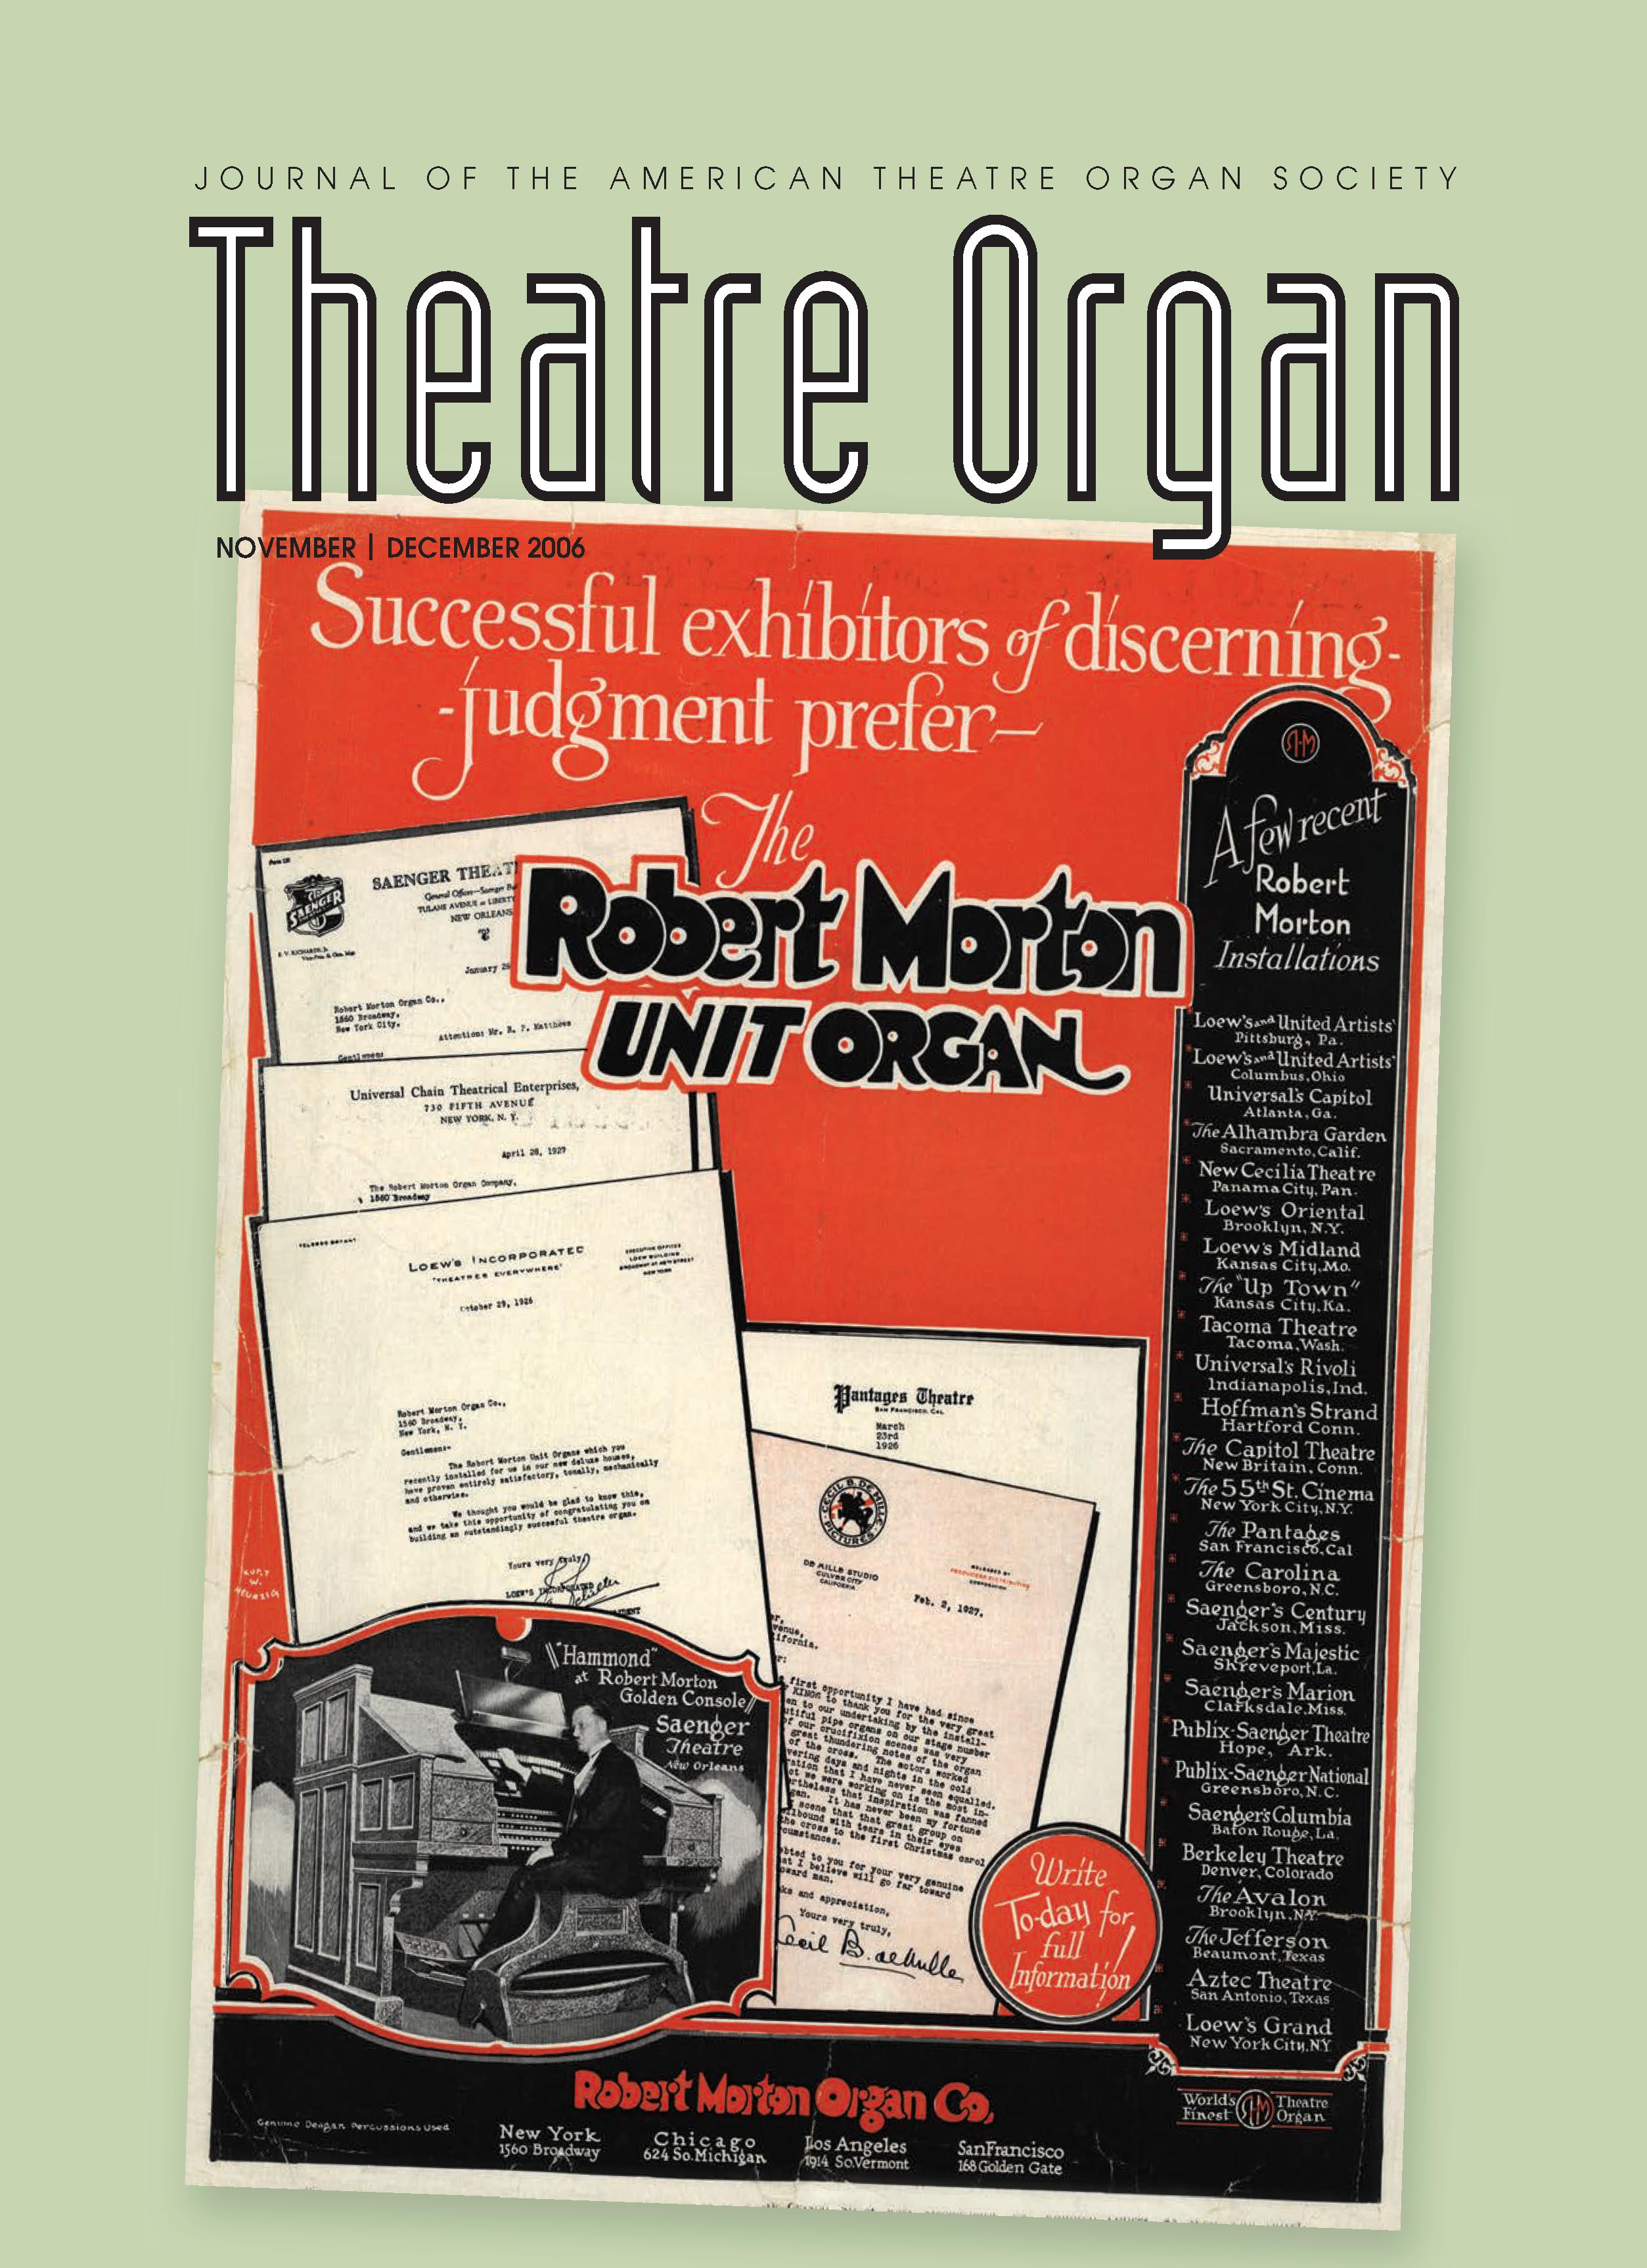 Theatre Organ, November - December 2006, Volume 48, Number 6